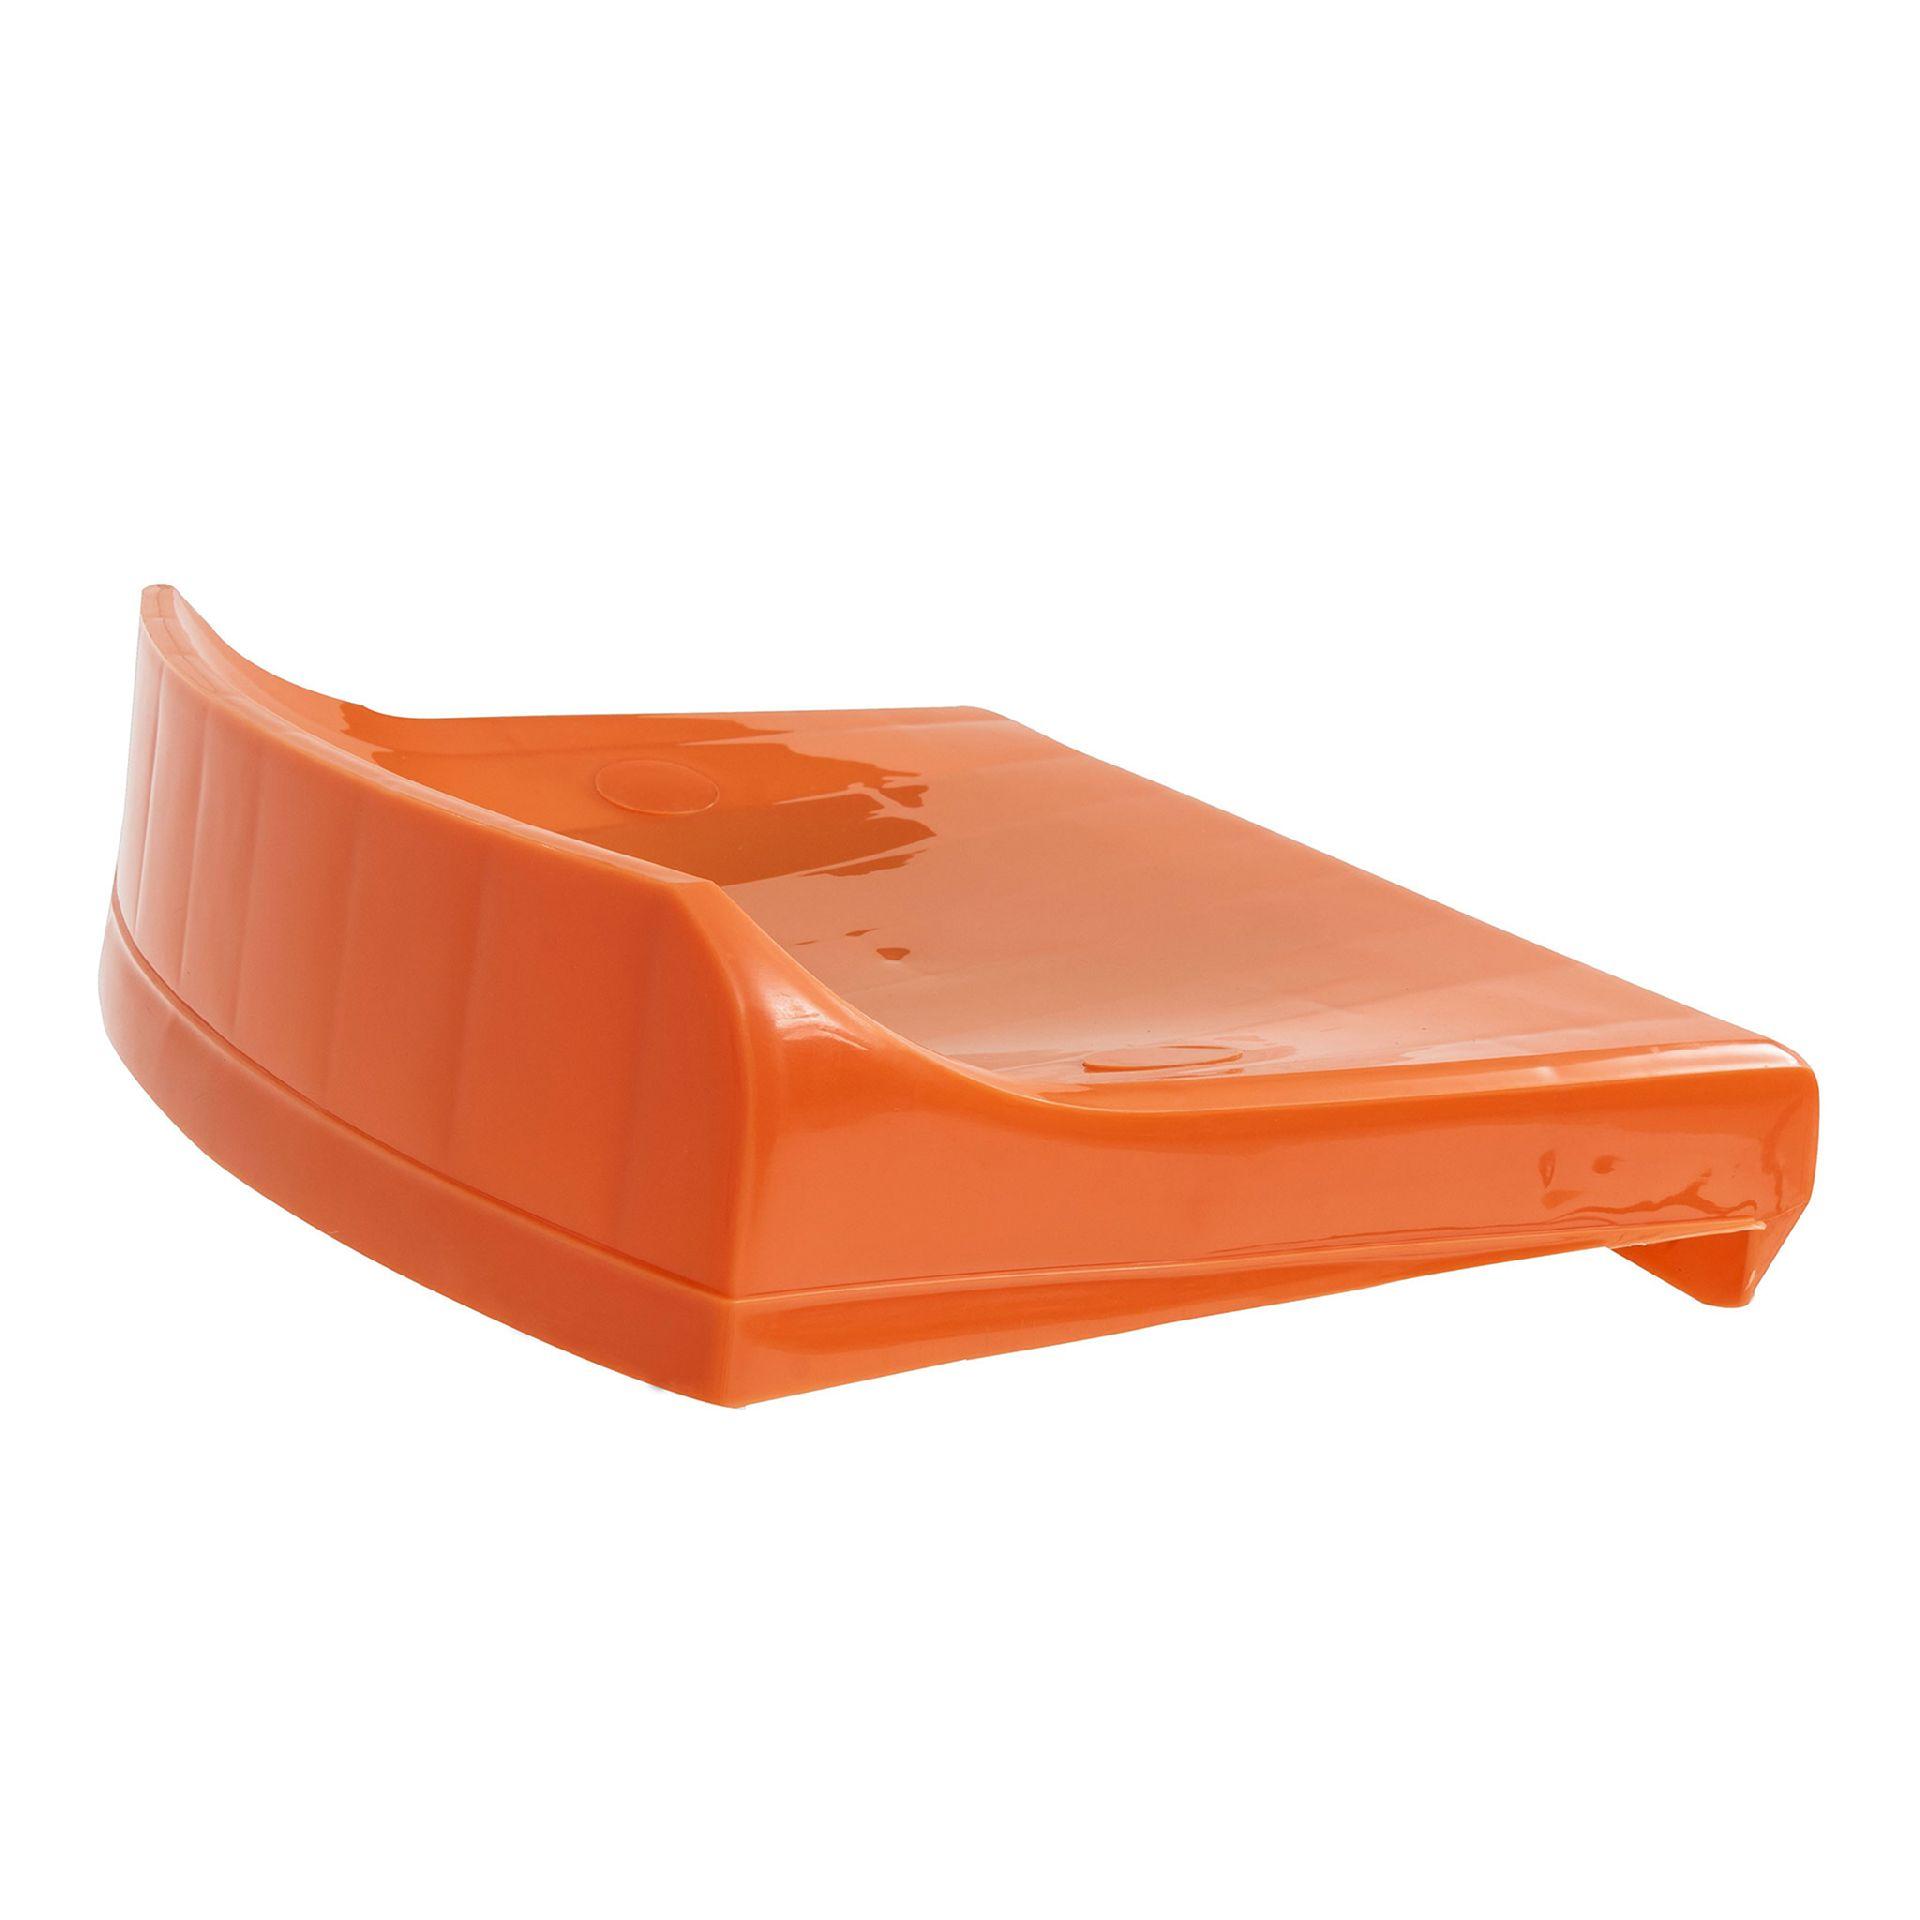 tema_backrest_monoblock_copolymer_pp_stadium_chair_seatorium_05